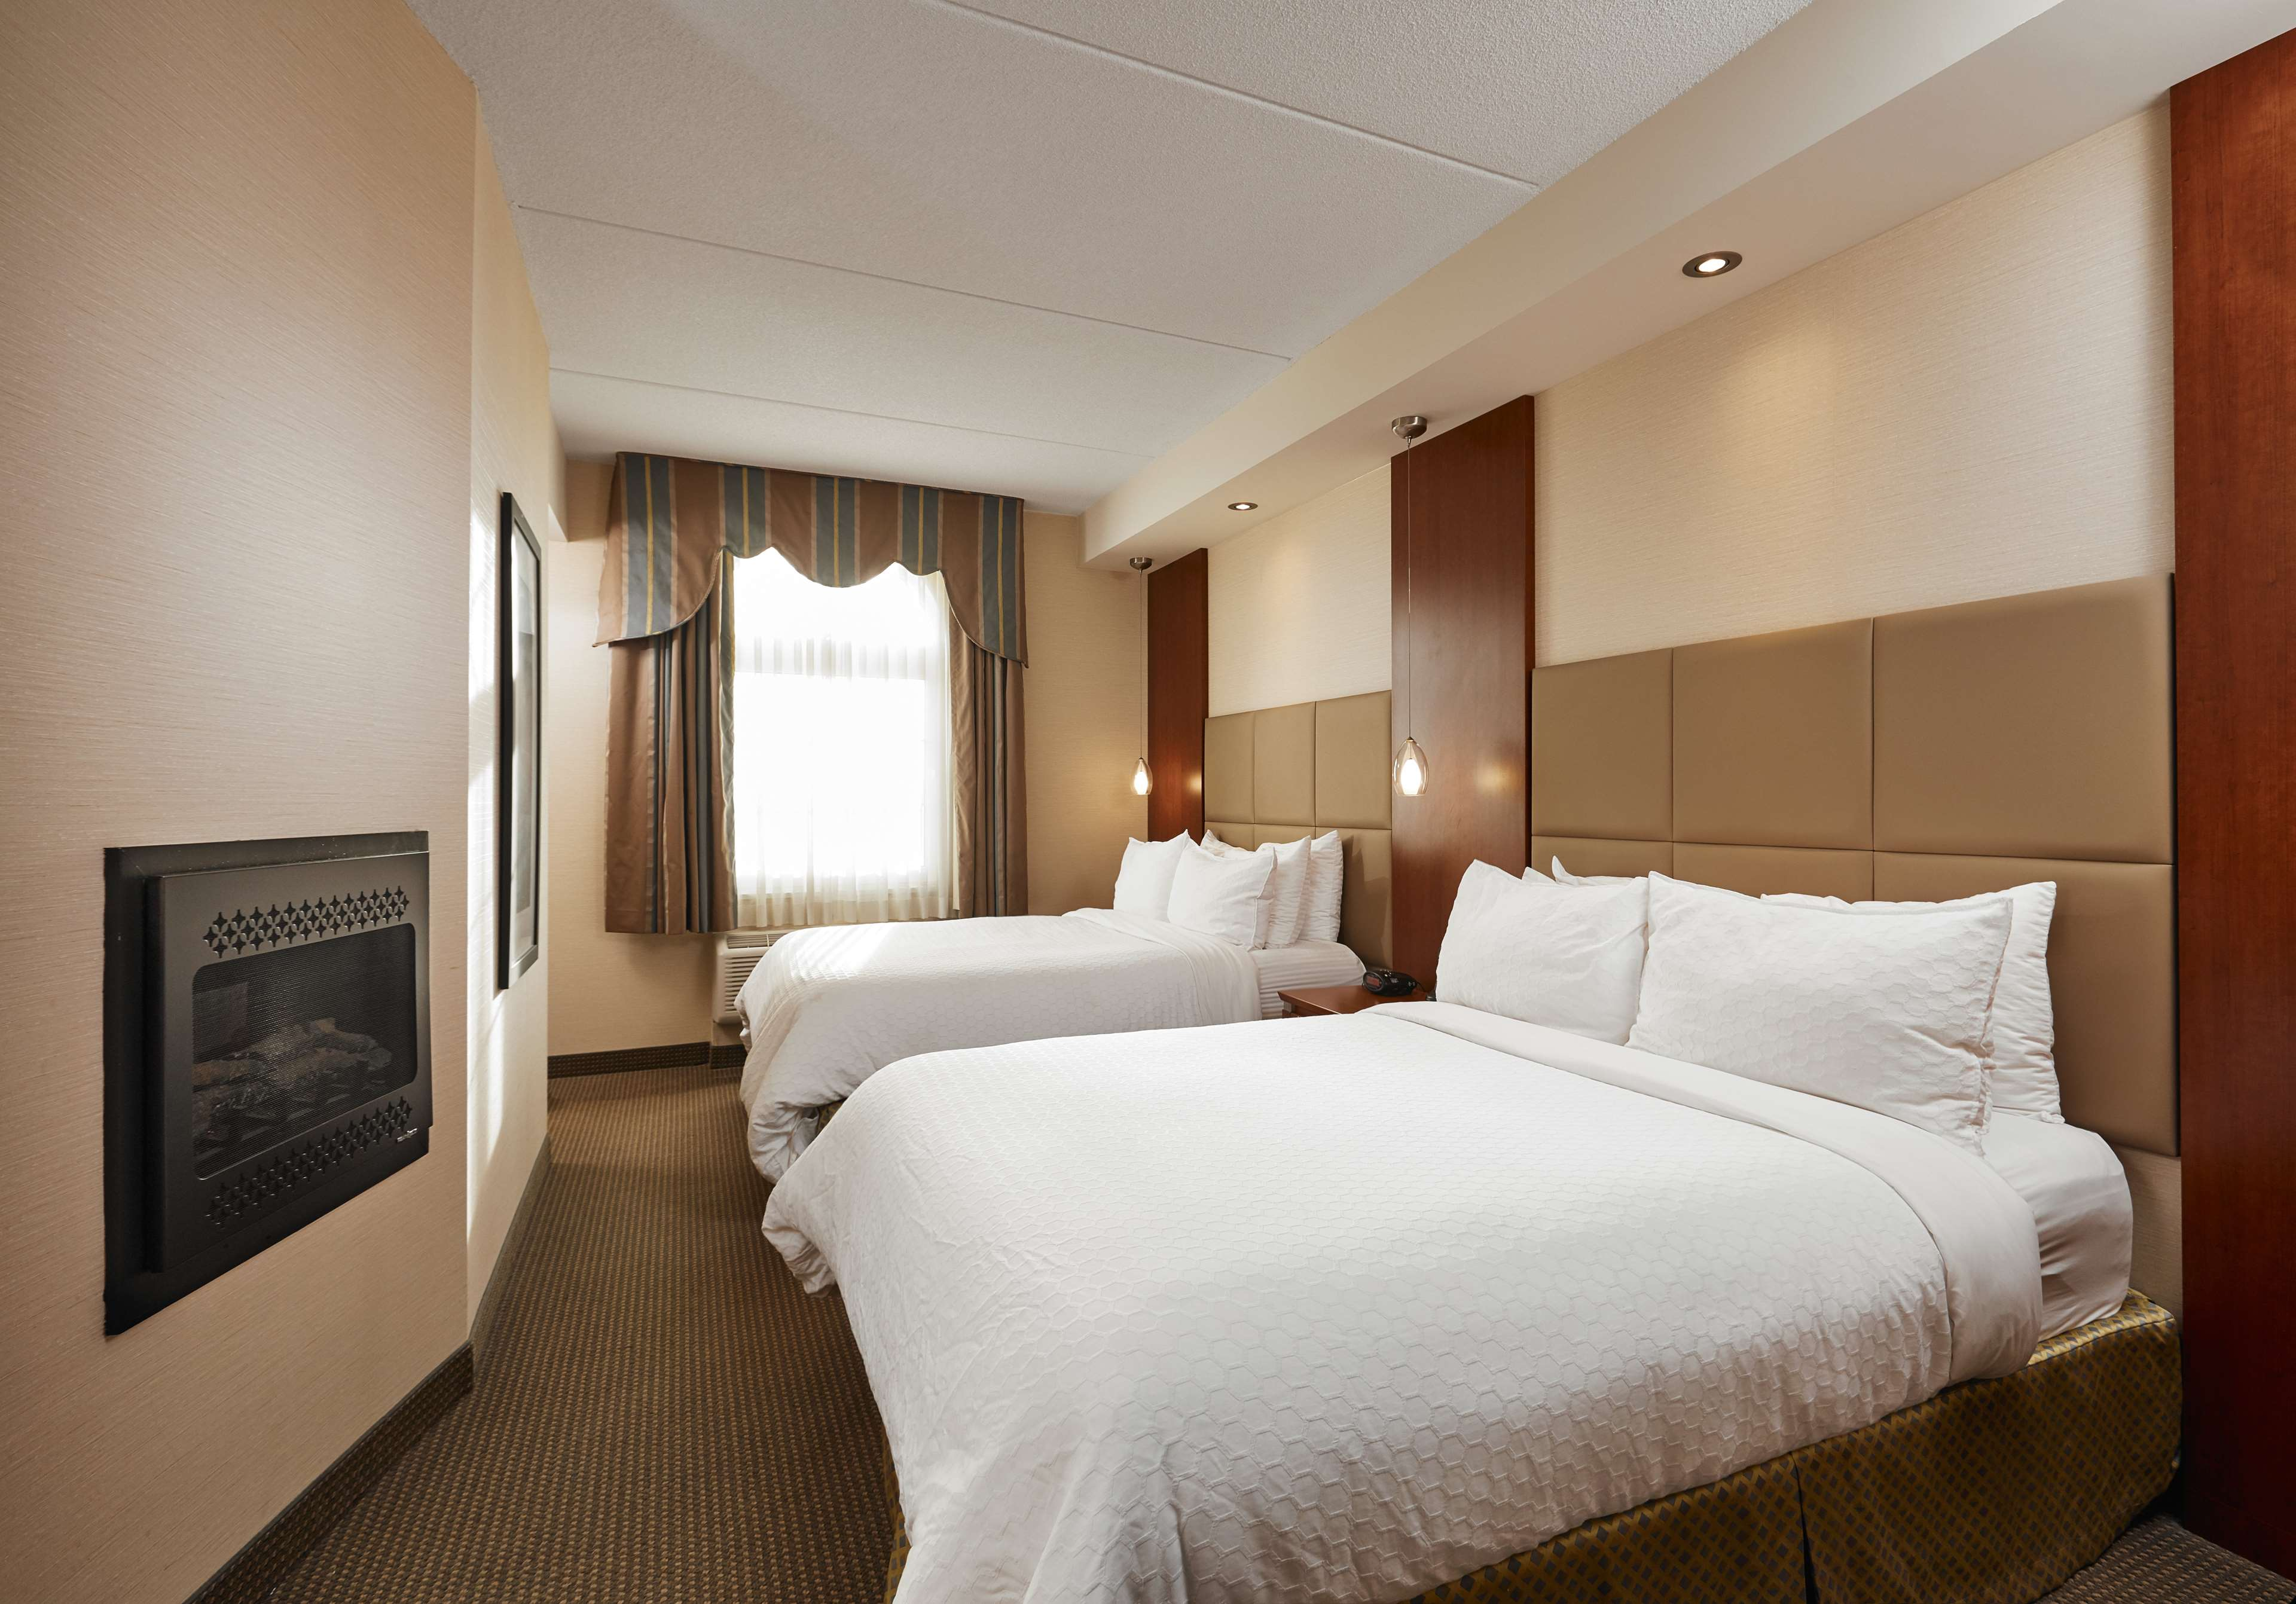 Best Western Orangeville Rooms